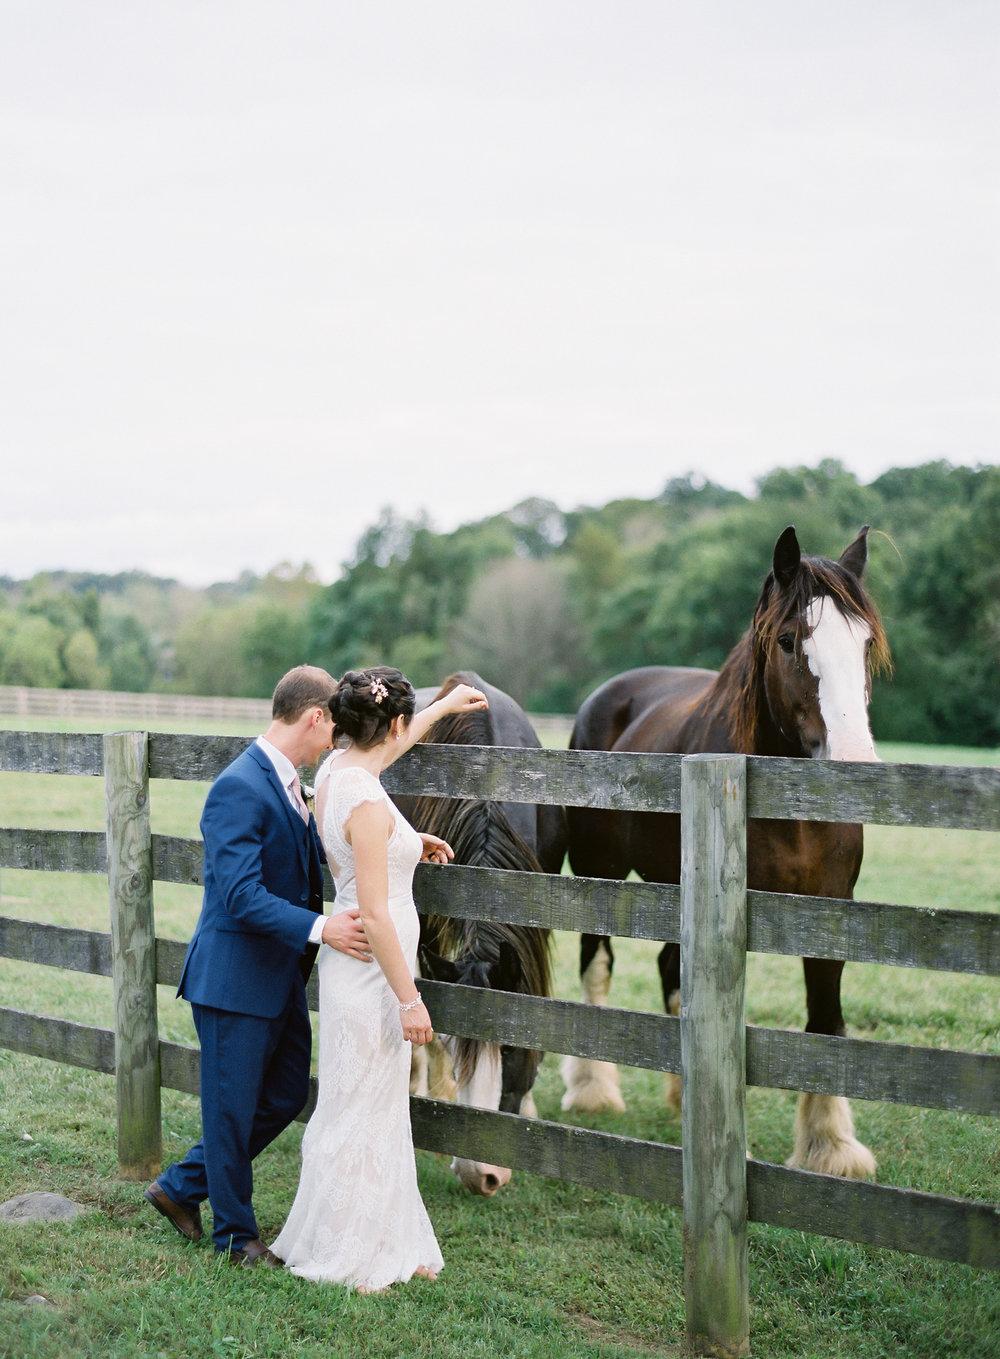 Vicki_Grafton_Photography_wedding-634.jpg